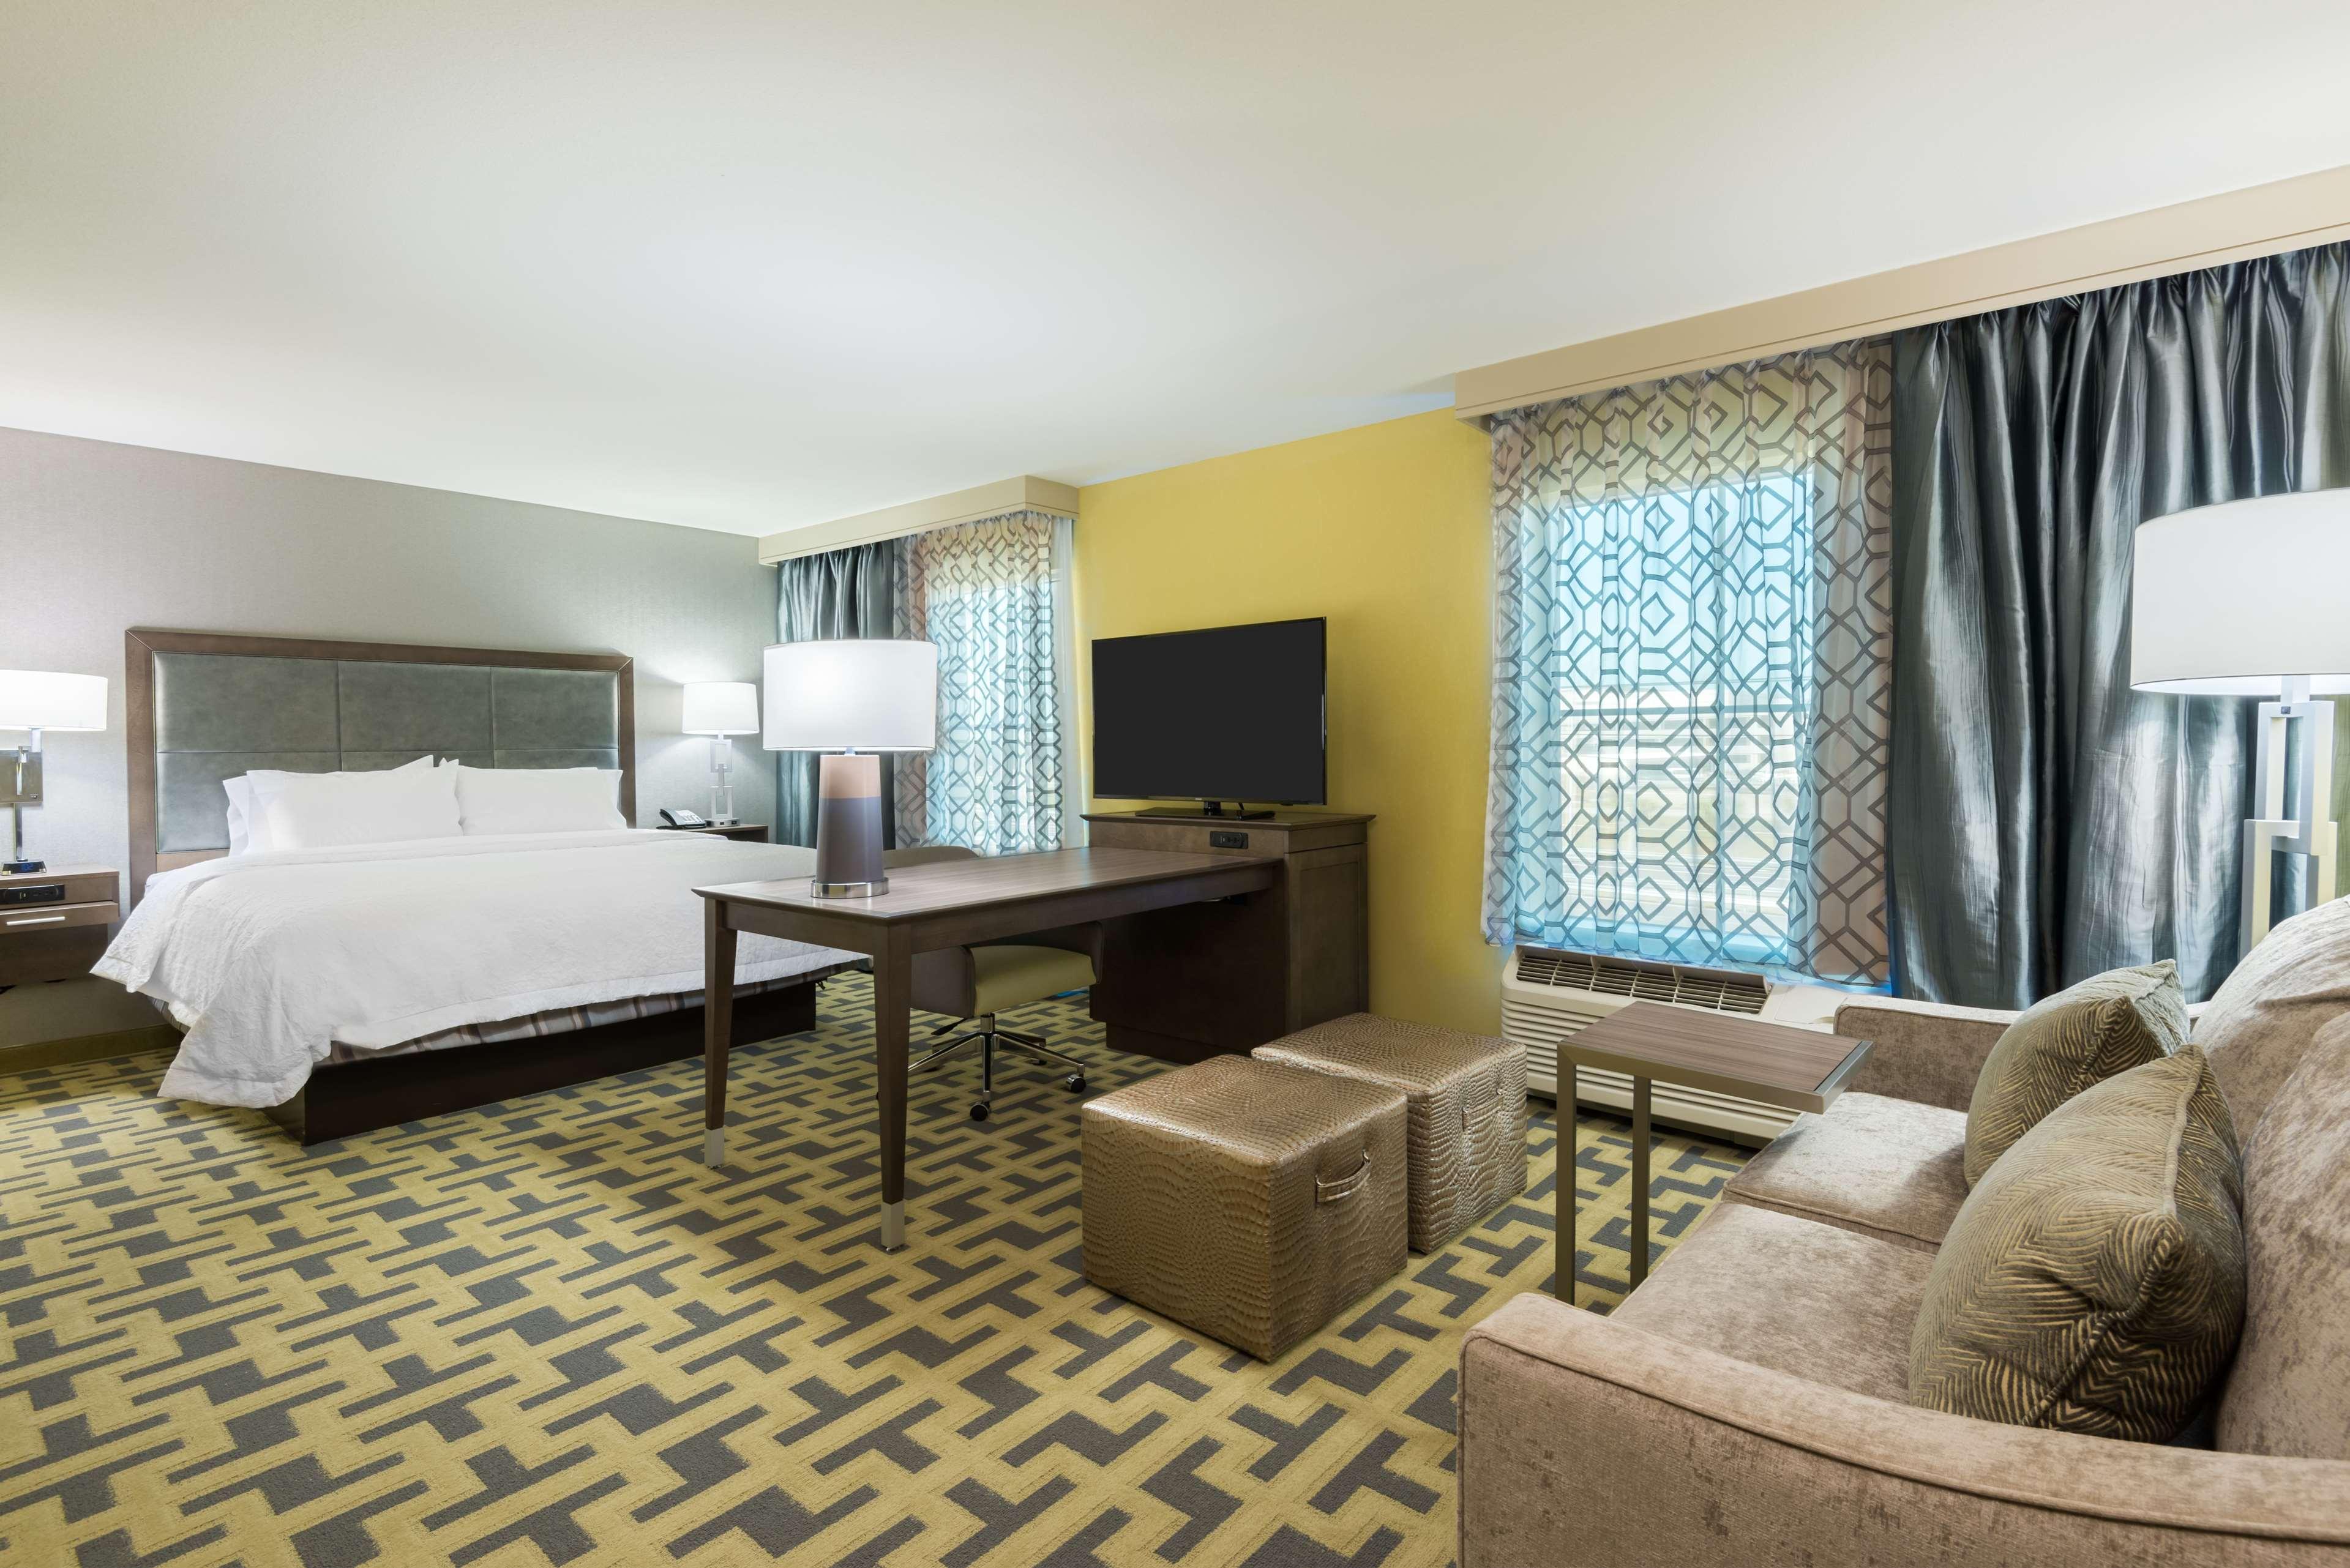 Hampton Inn & Suites Tampa Airport Avion Park Westshore image 22